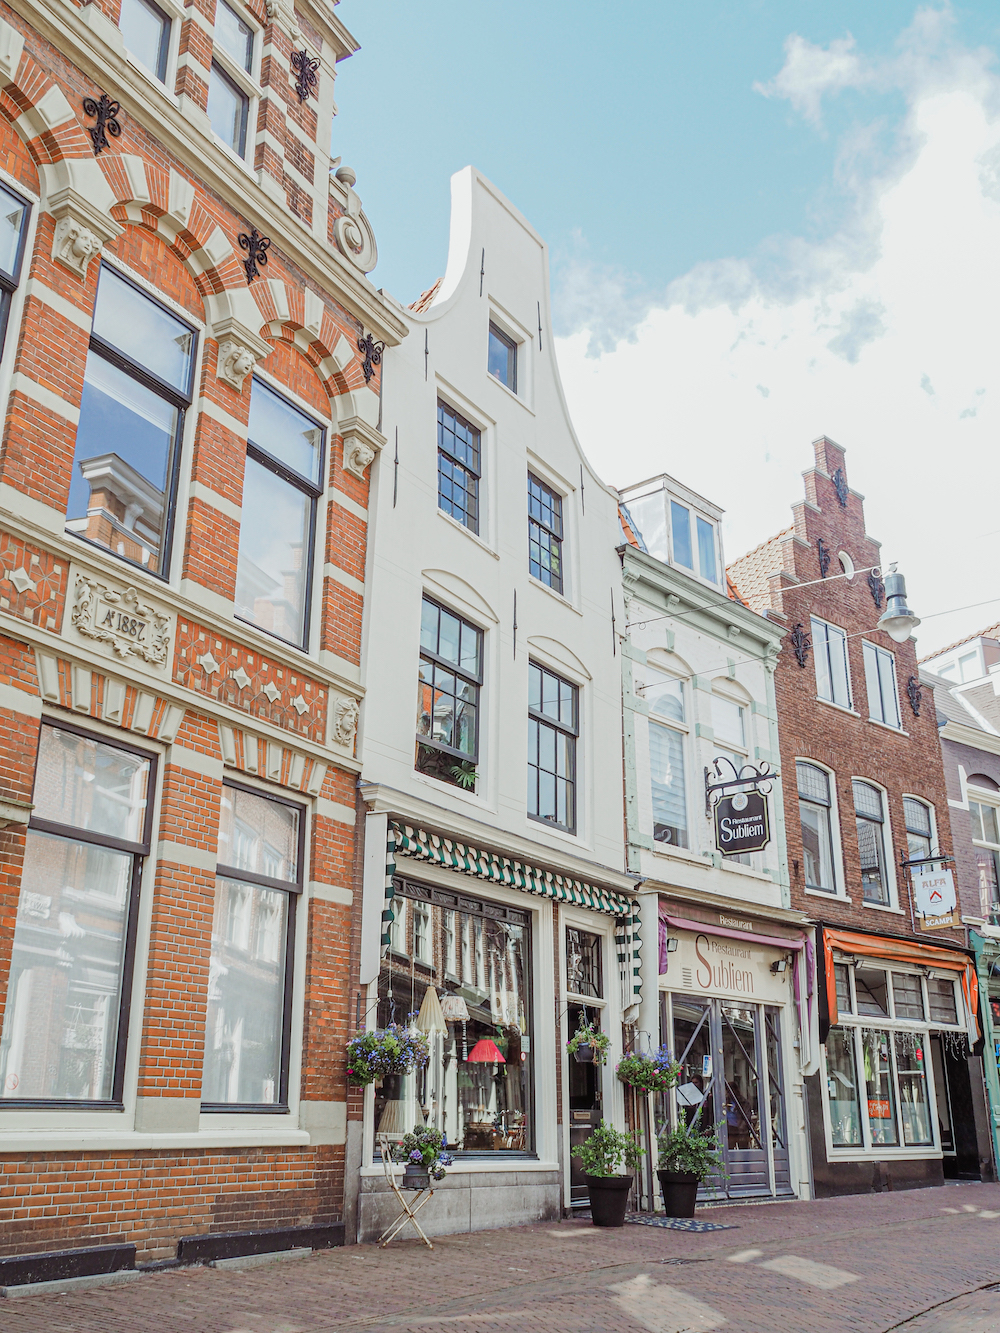 Shoppen in Haarlem